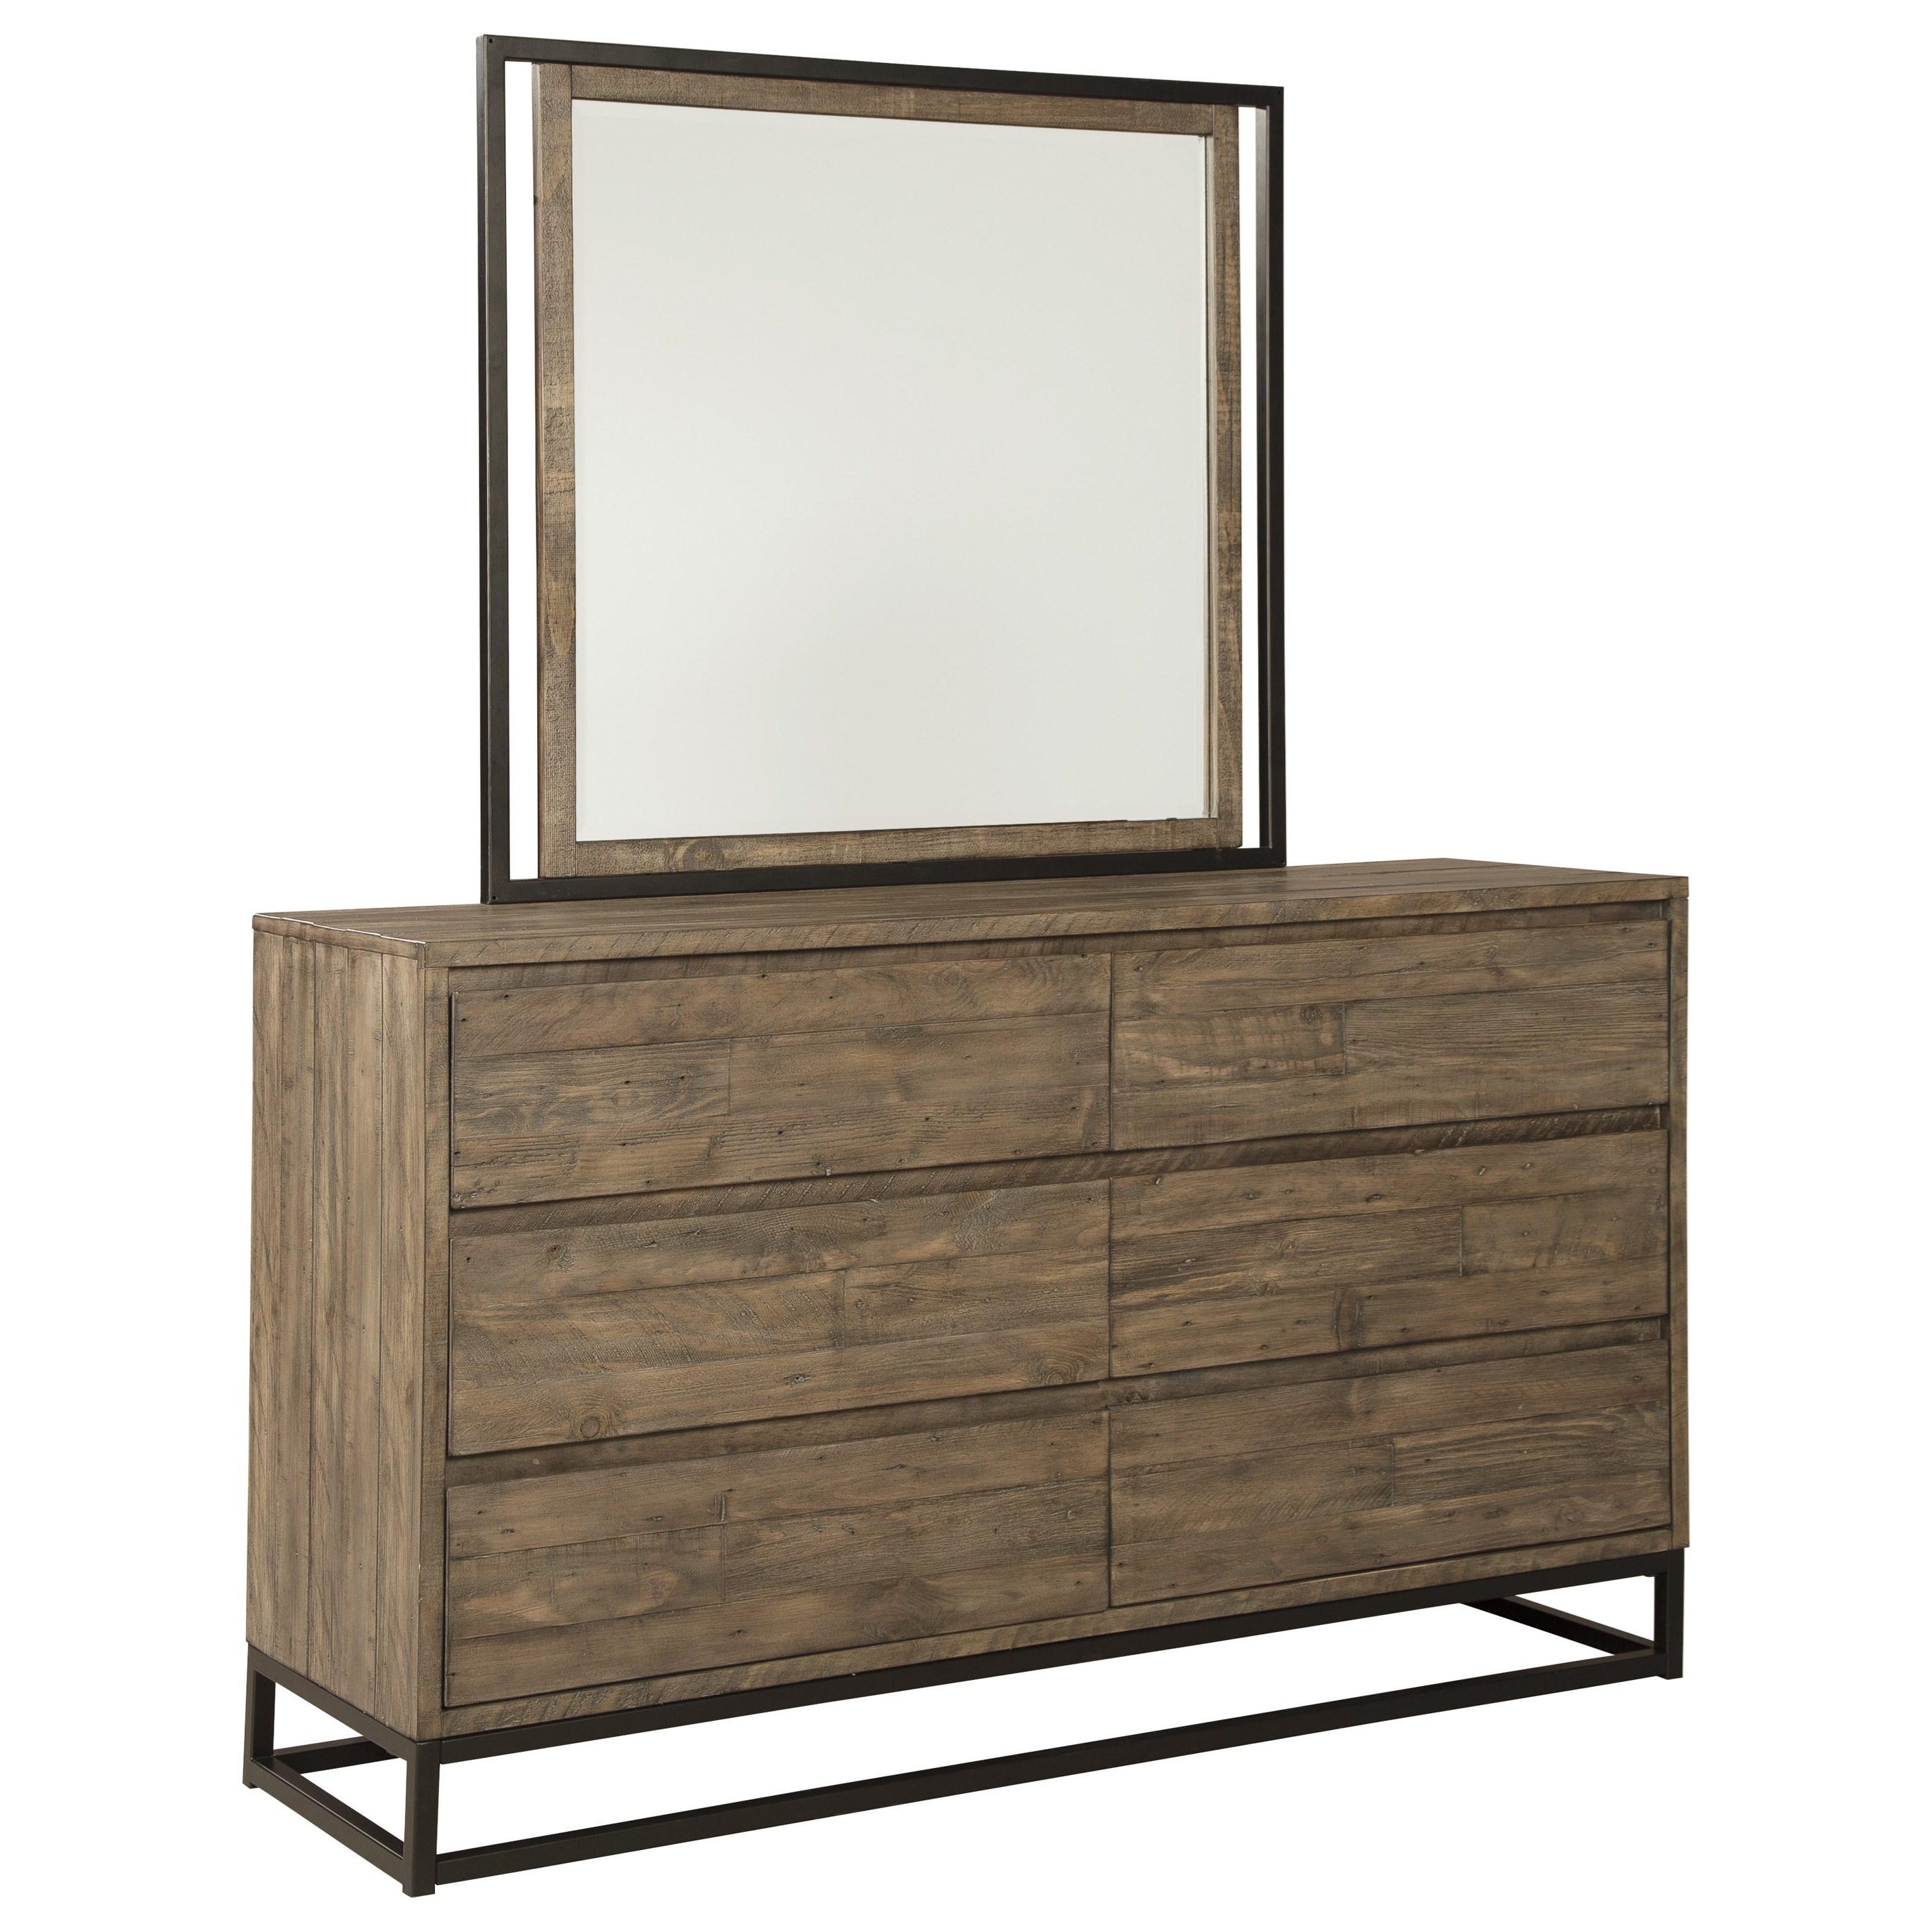 Cazentine Dresser and Mirror Set by Signature Design by Ashley at Lapeer Furniture & Mattress Center